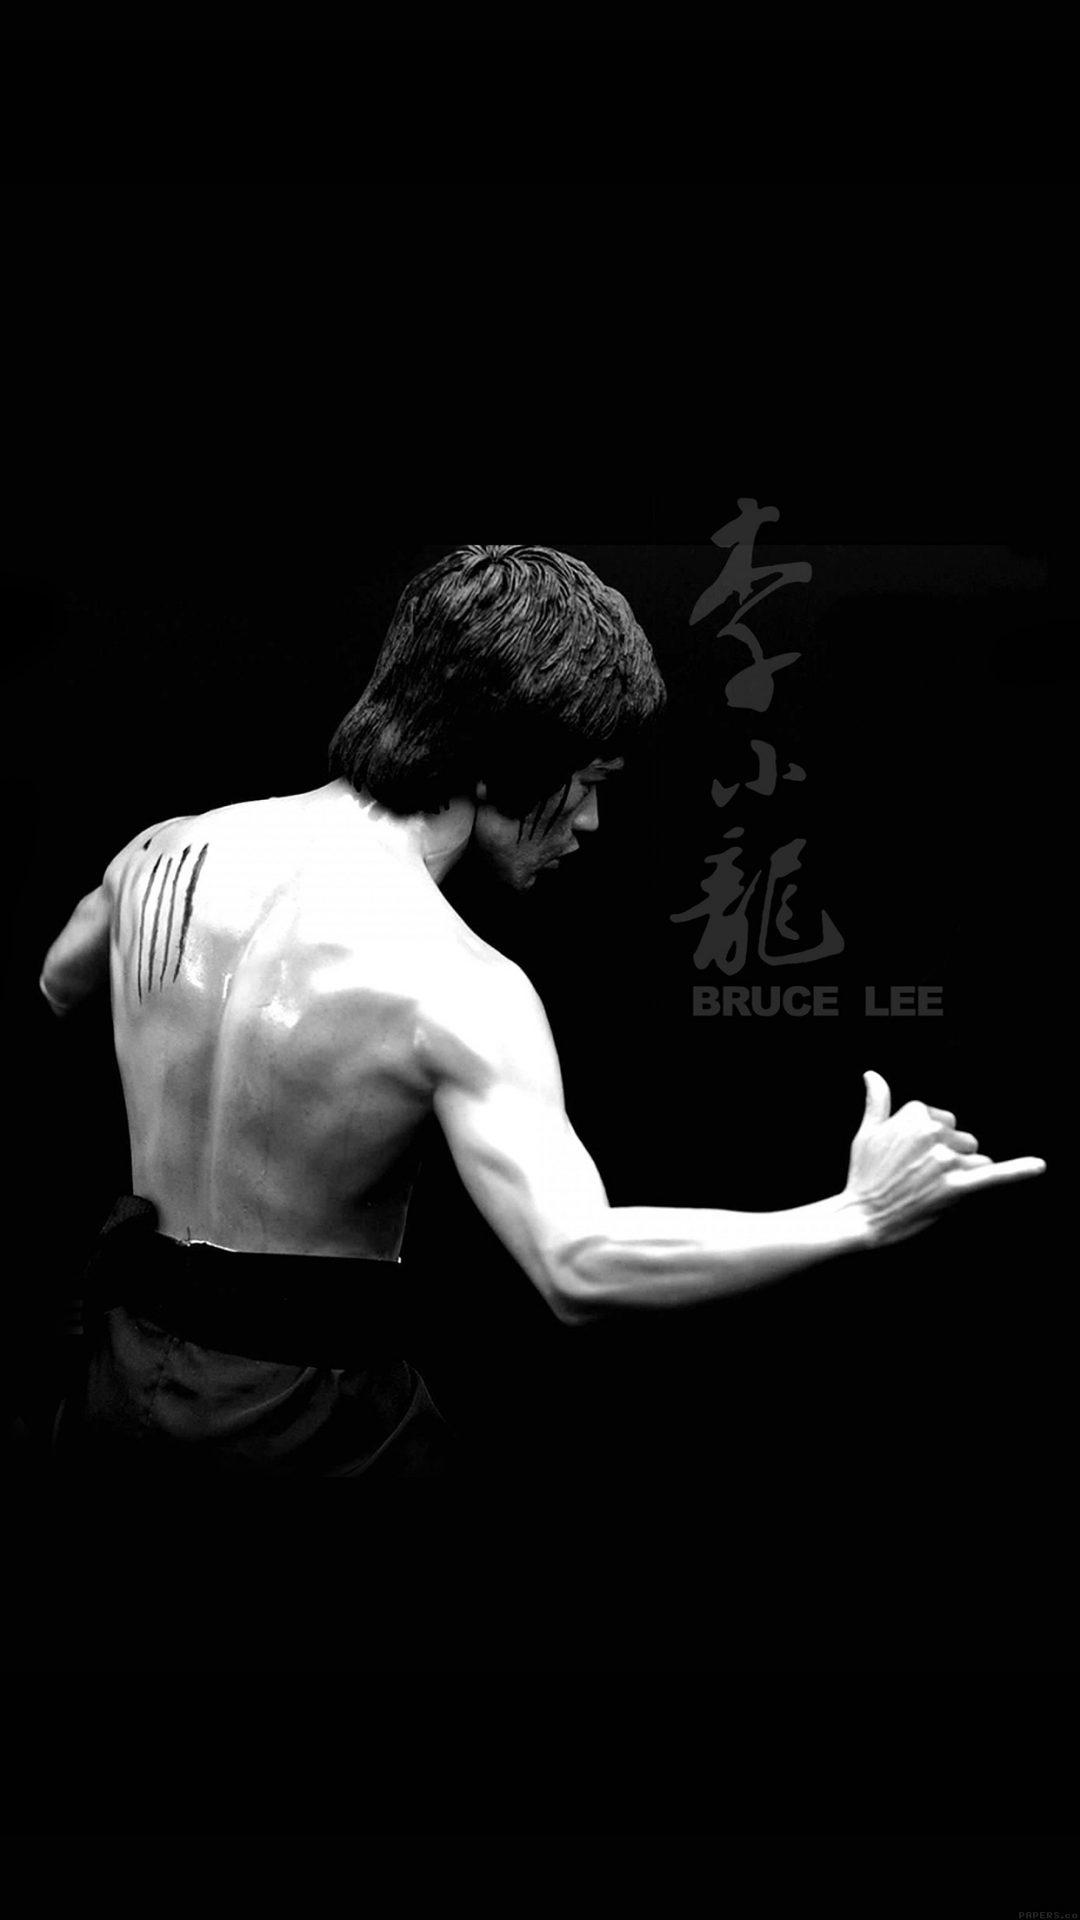 Bruce Lee Sports Actor Celebrity Dark